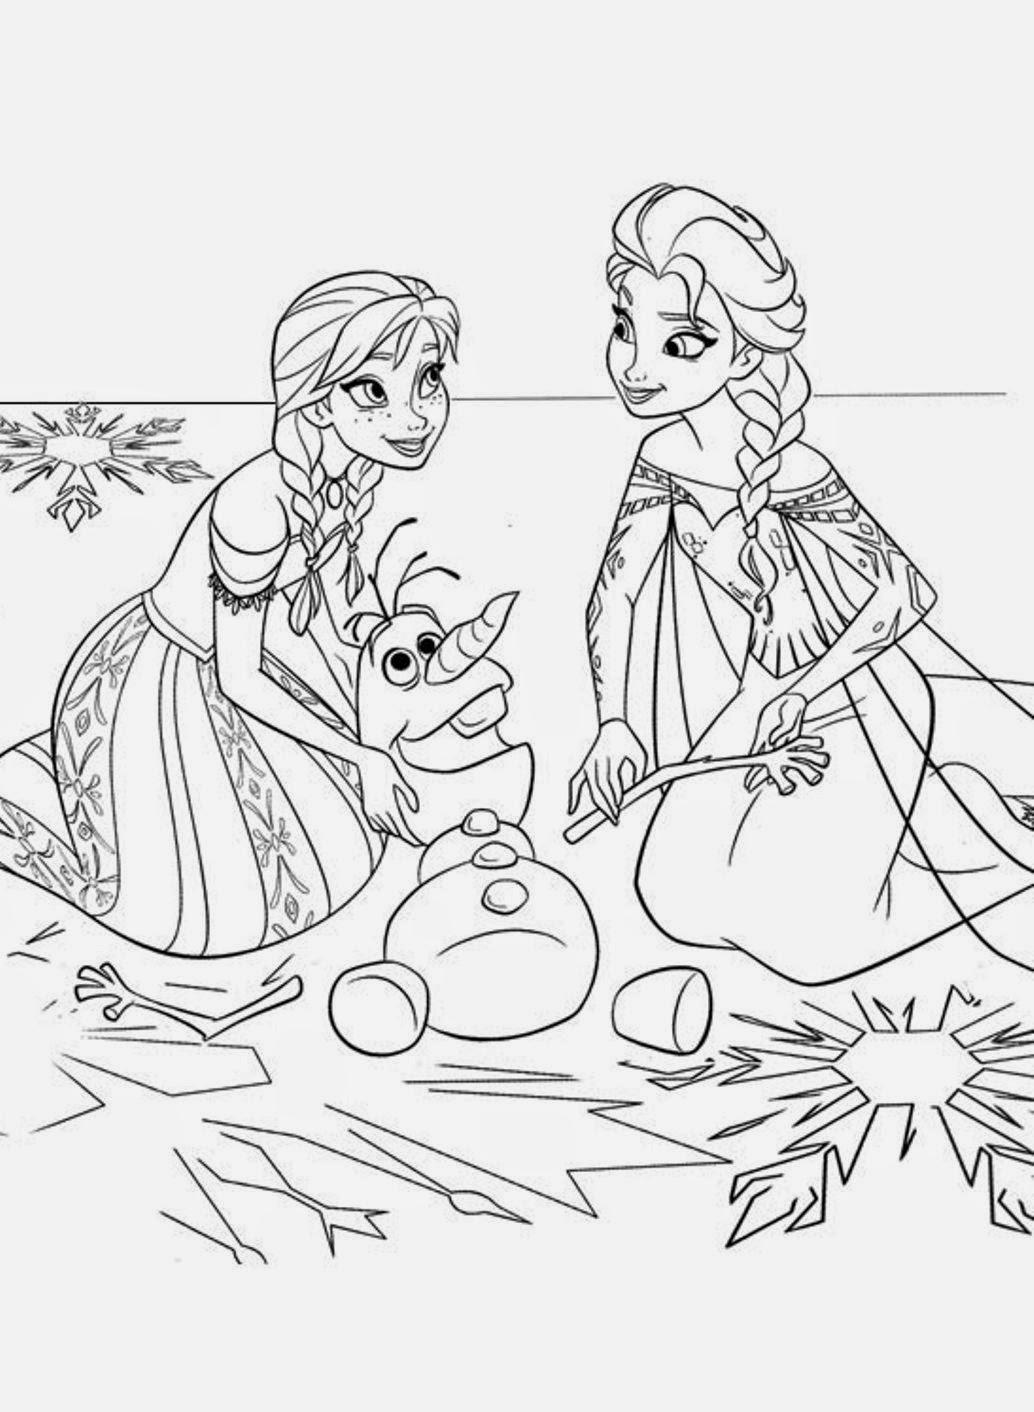 Desenhos Animados Para Colorir E Imprimir Desenhos Da Frozen Para